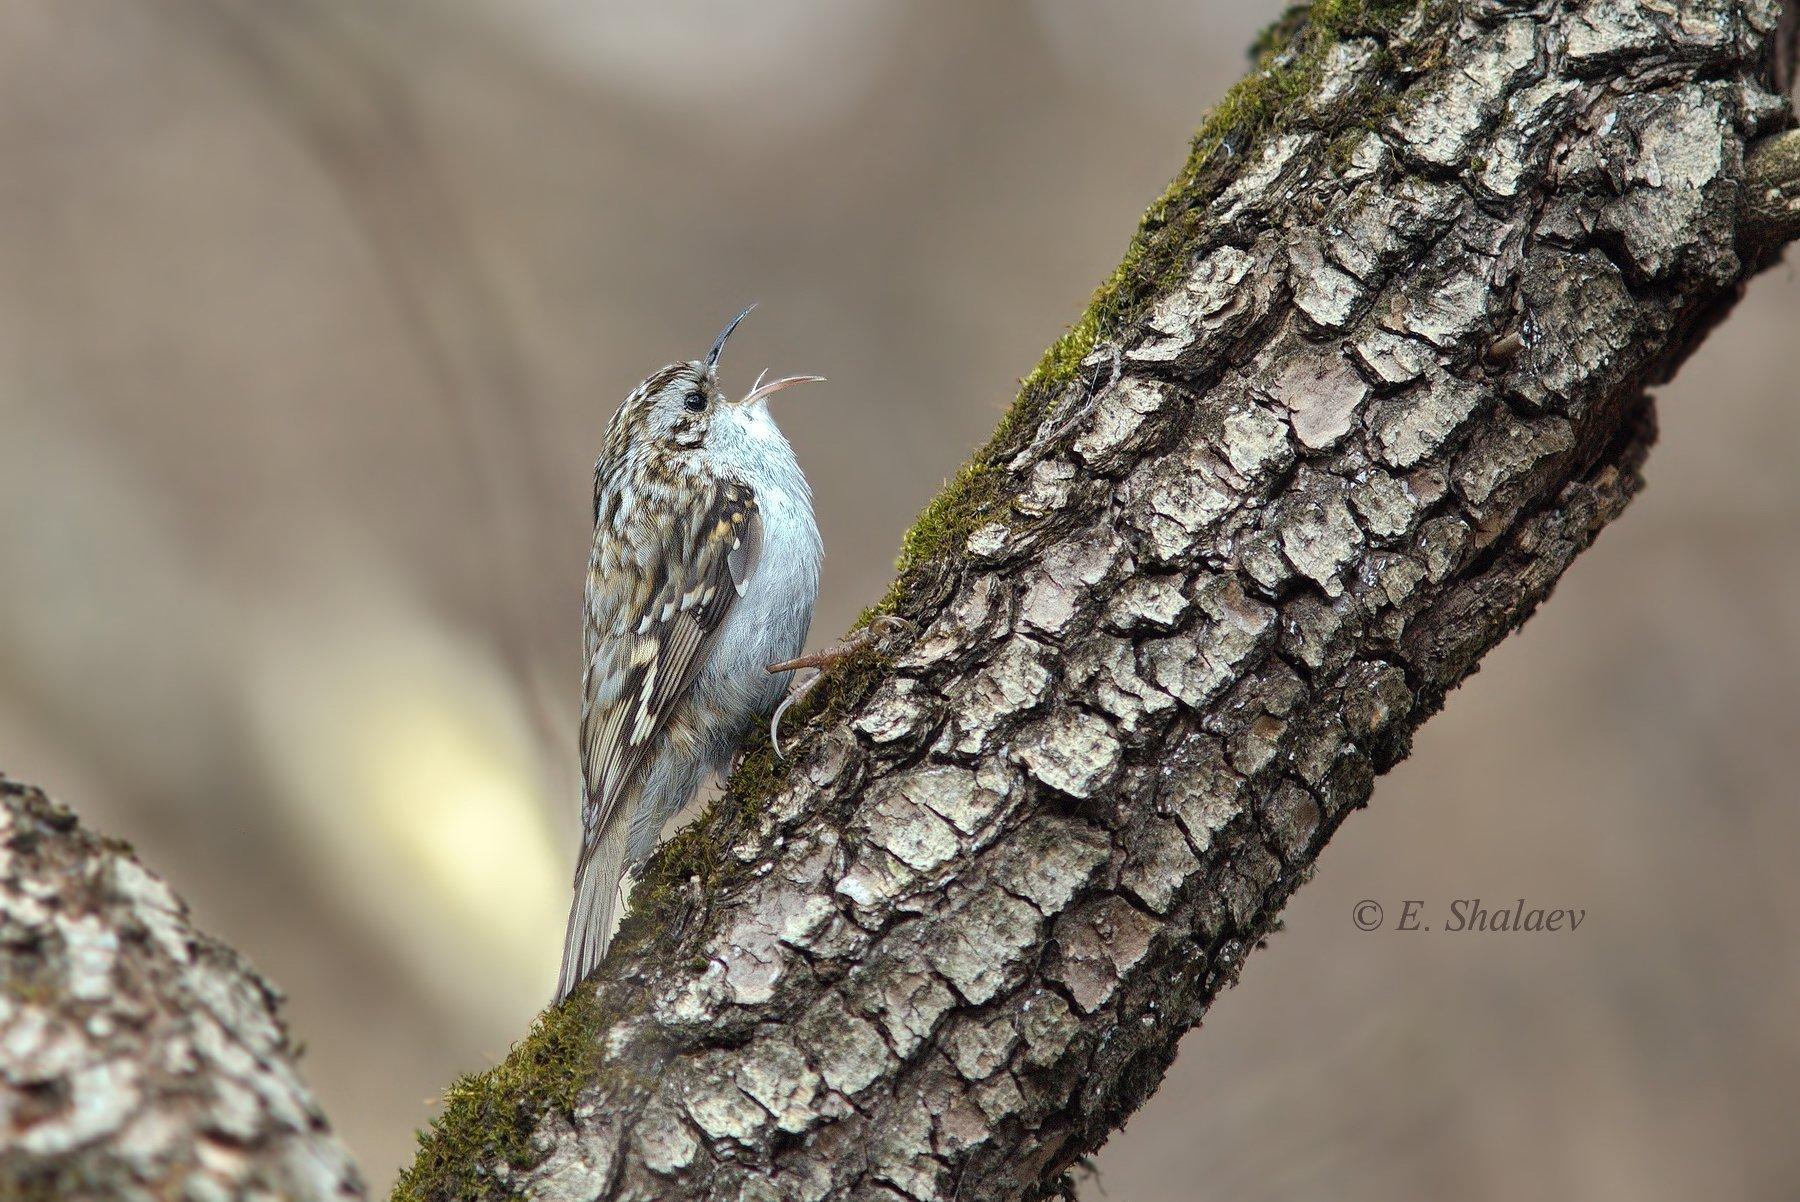 birds,certhia familiaris,eurasian treecreeper,обыкновенная пищуха,птица,птицы,фотоохота, Евгений